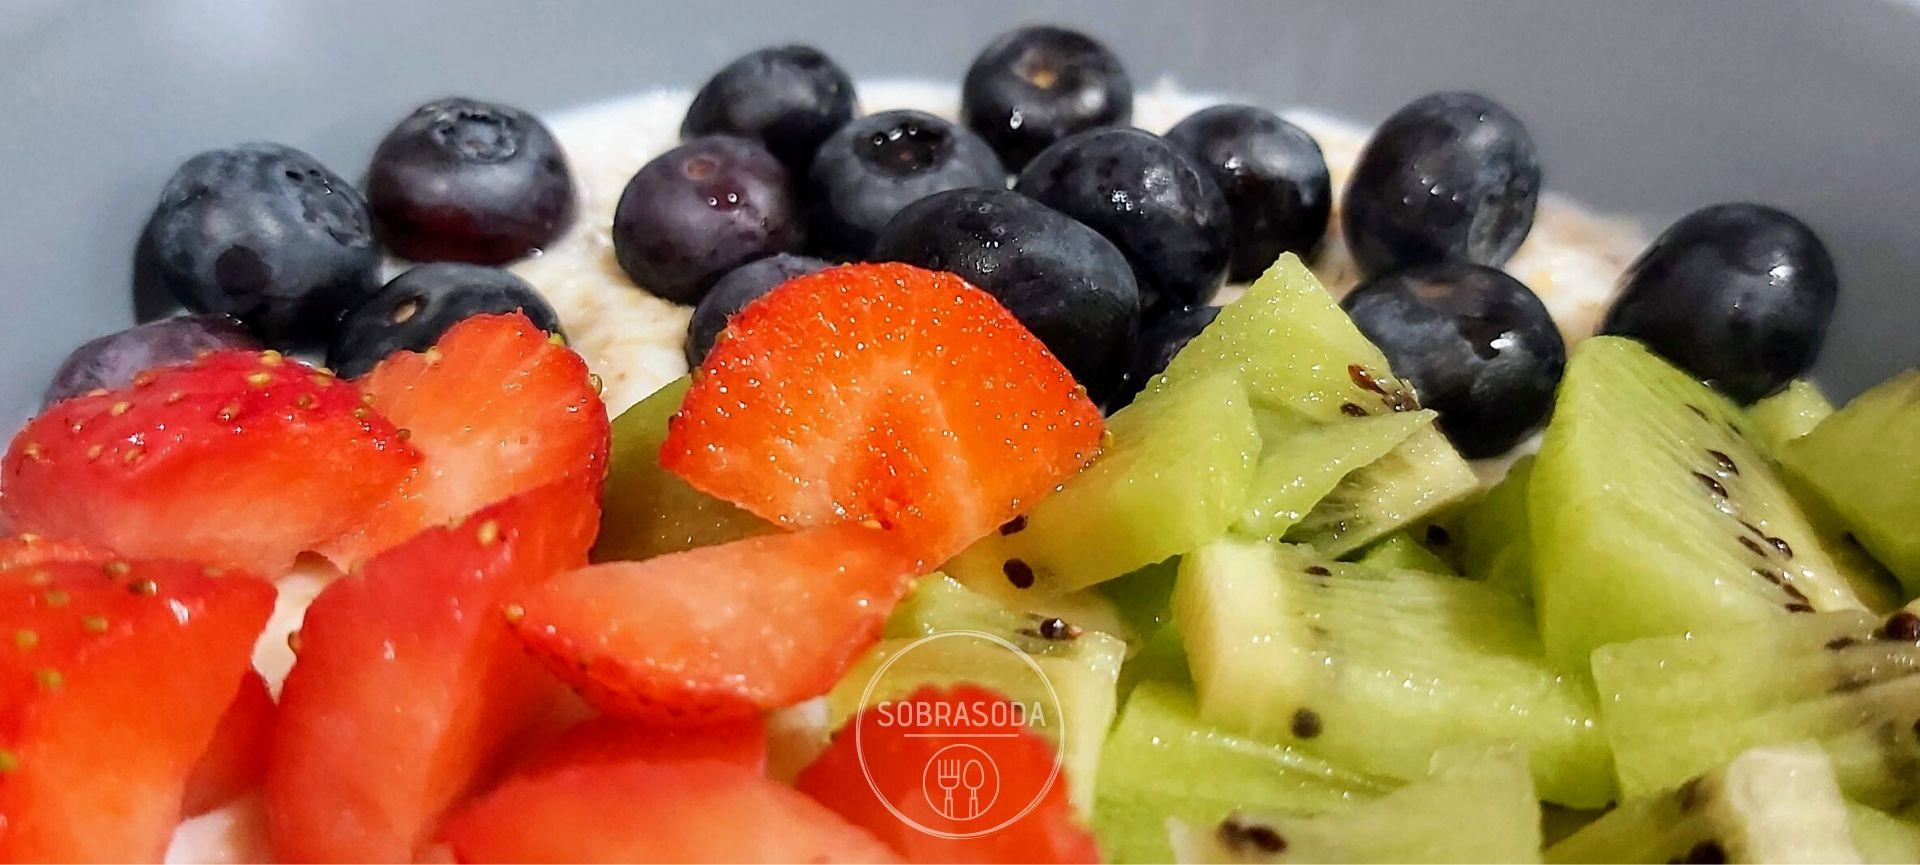 Sobrasoda - Porridge con kiwi, arándonos y fresas